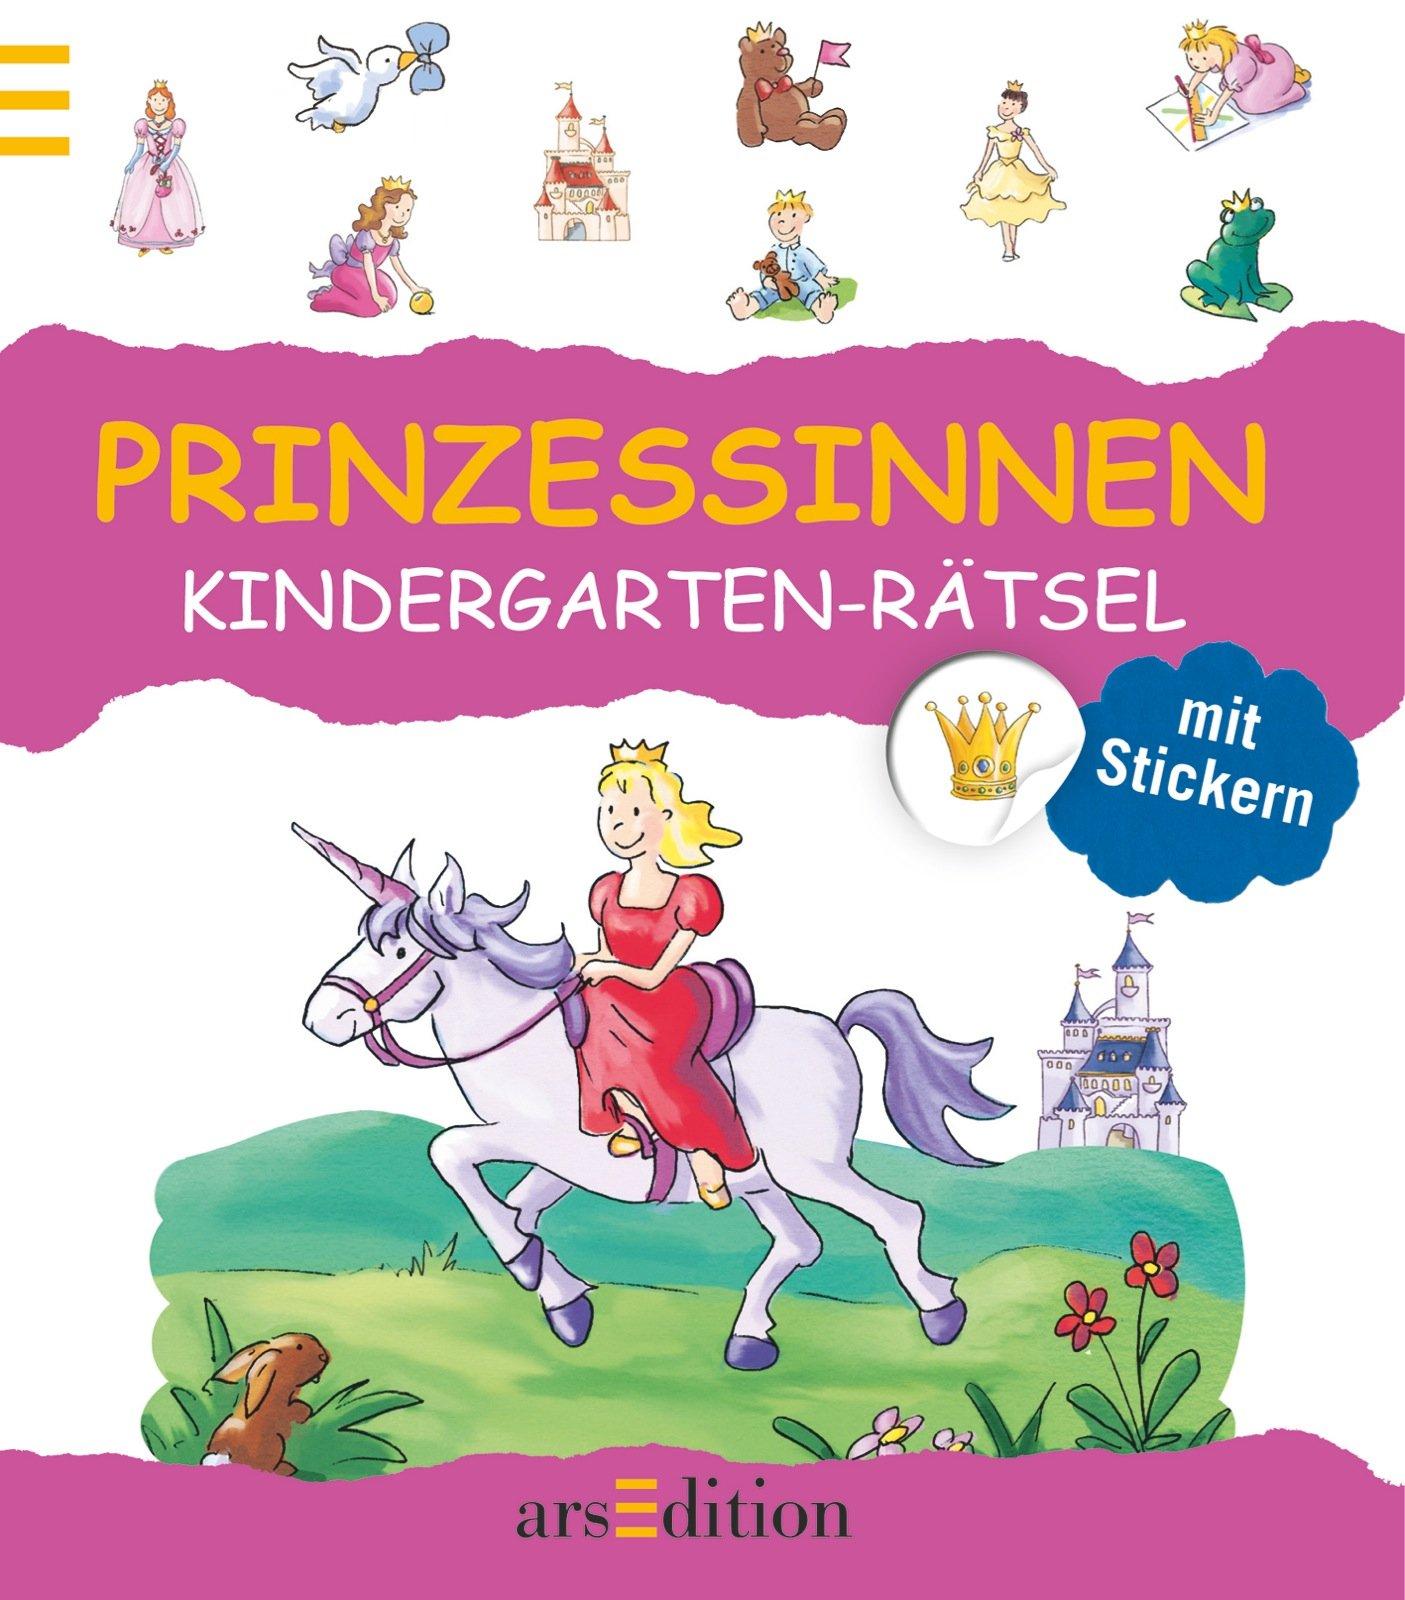 Kindergarten-Rätsel Prinzessinnen